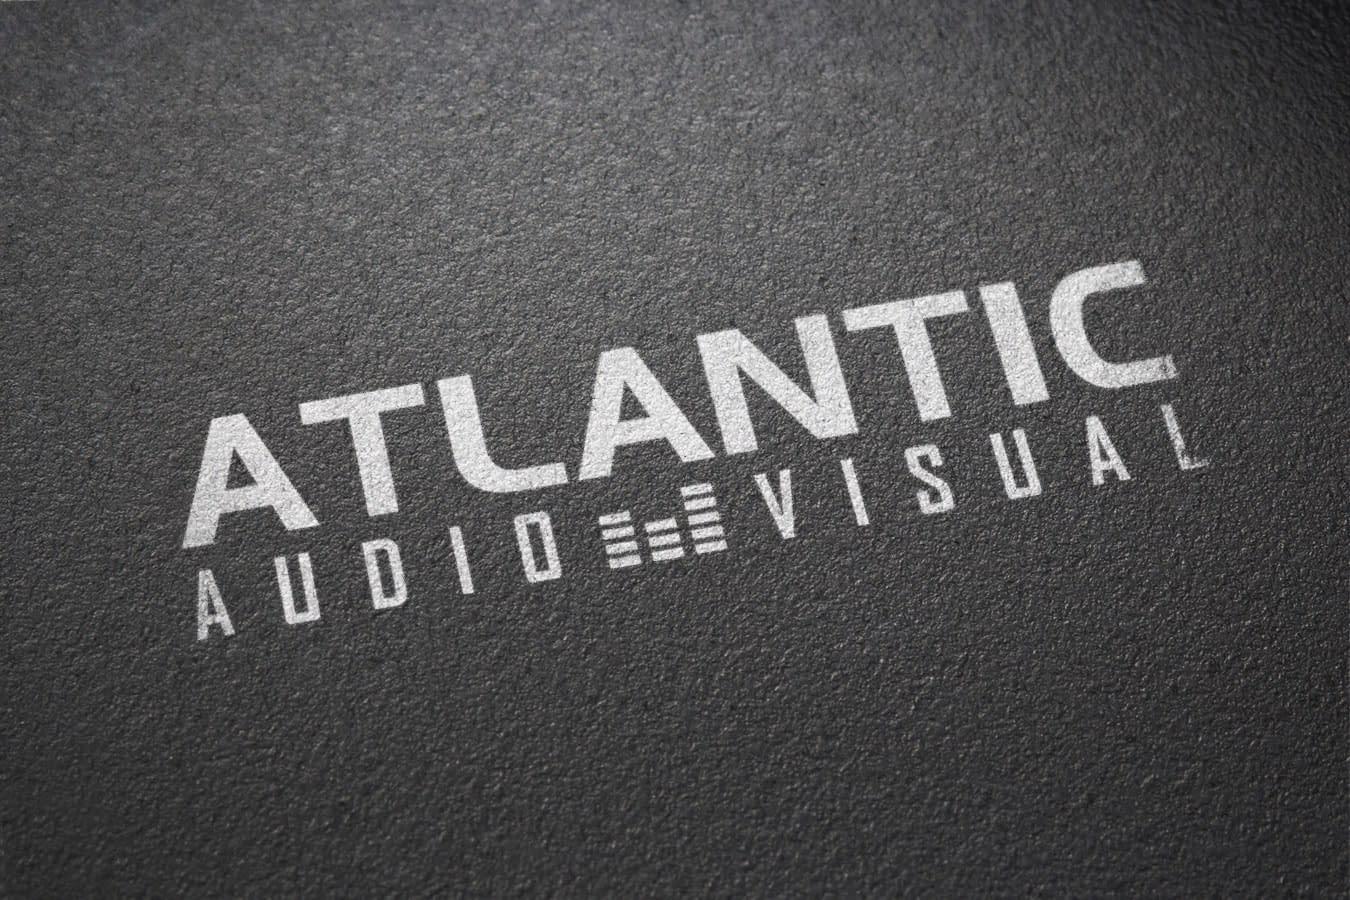 logos_atlanticav_bw